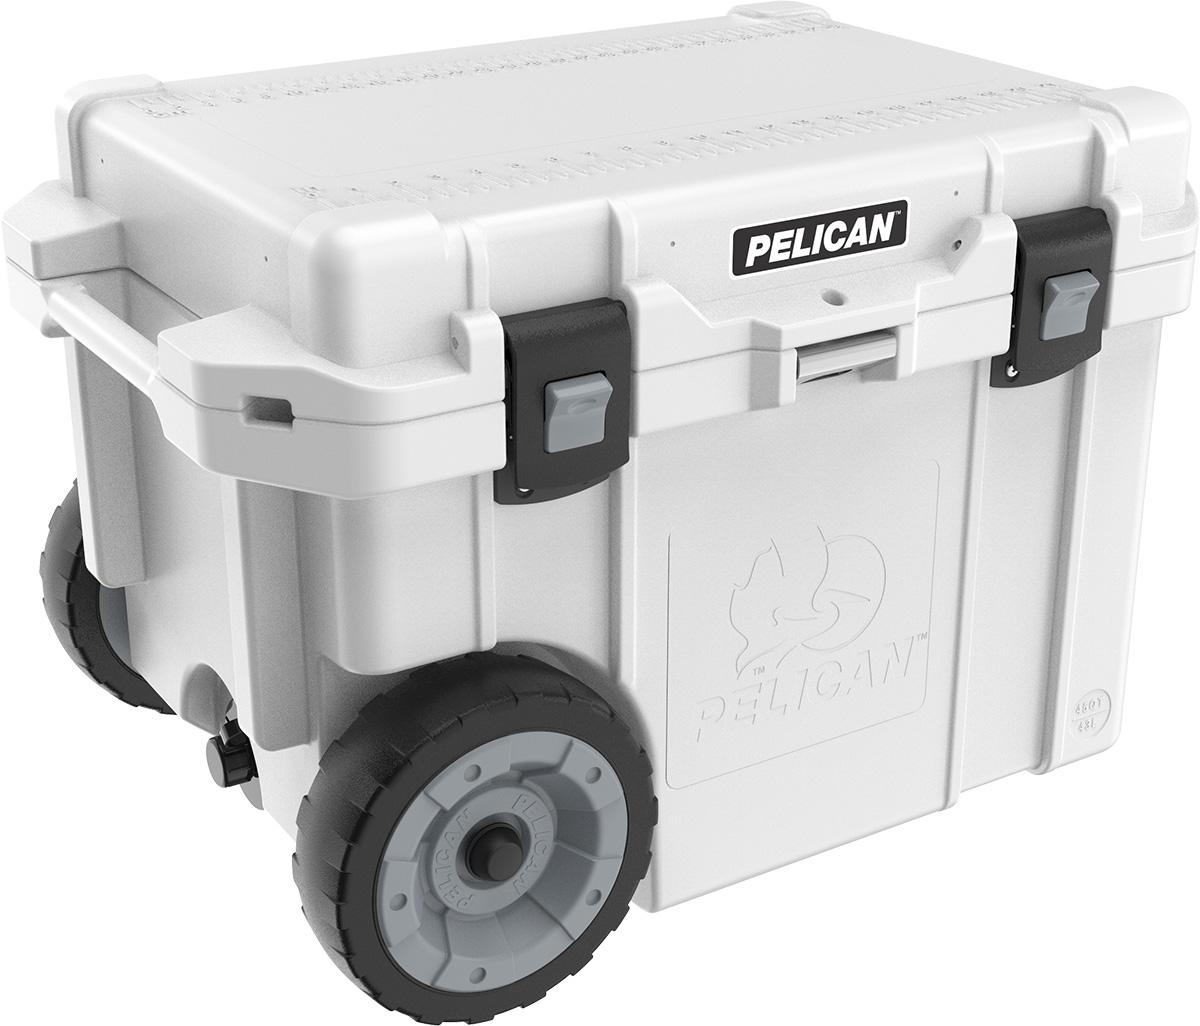 Heavy Duty Coolers : Qw elite wheeled cooler pelican